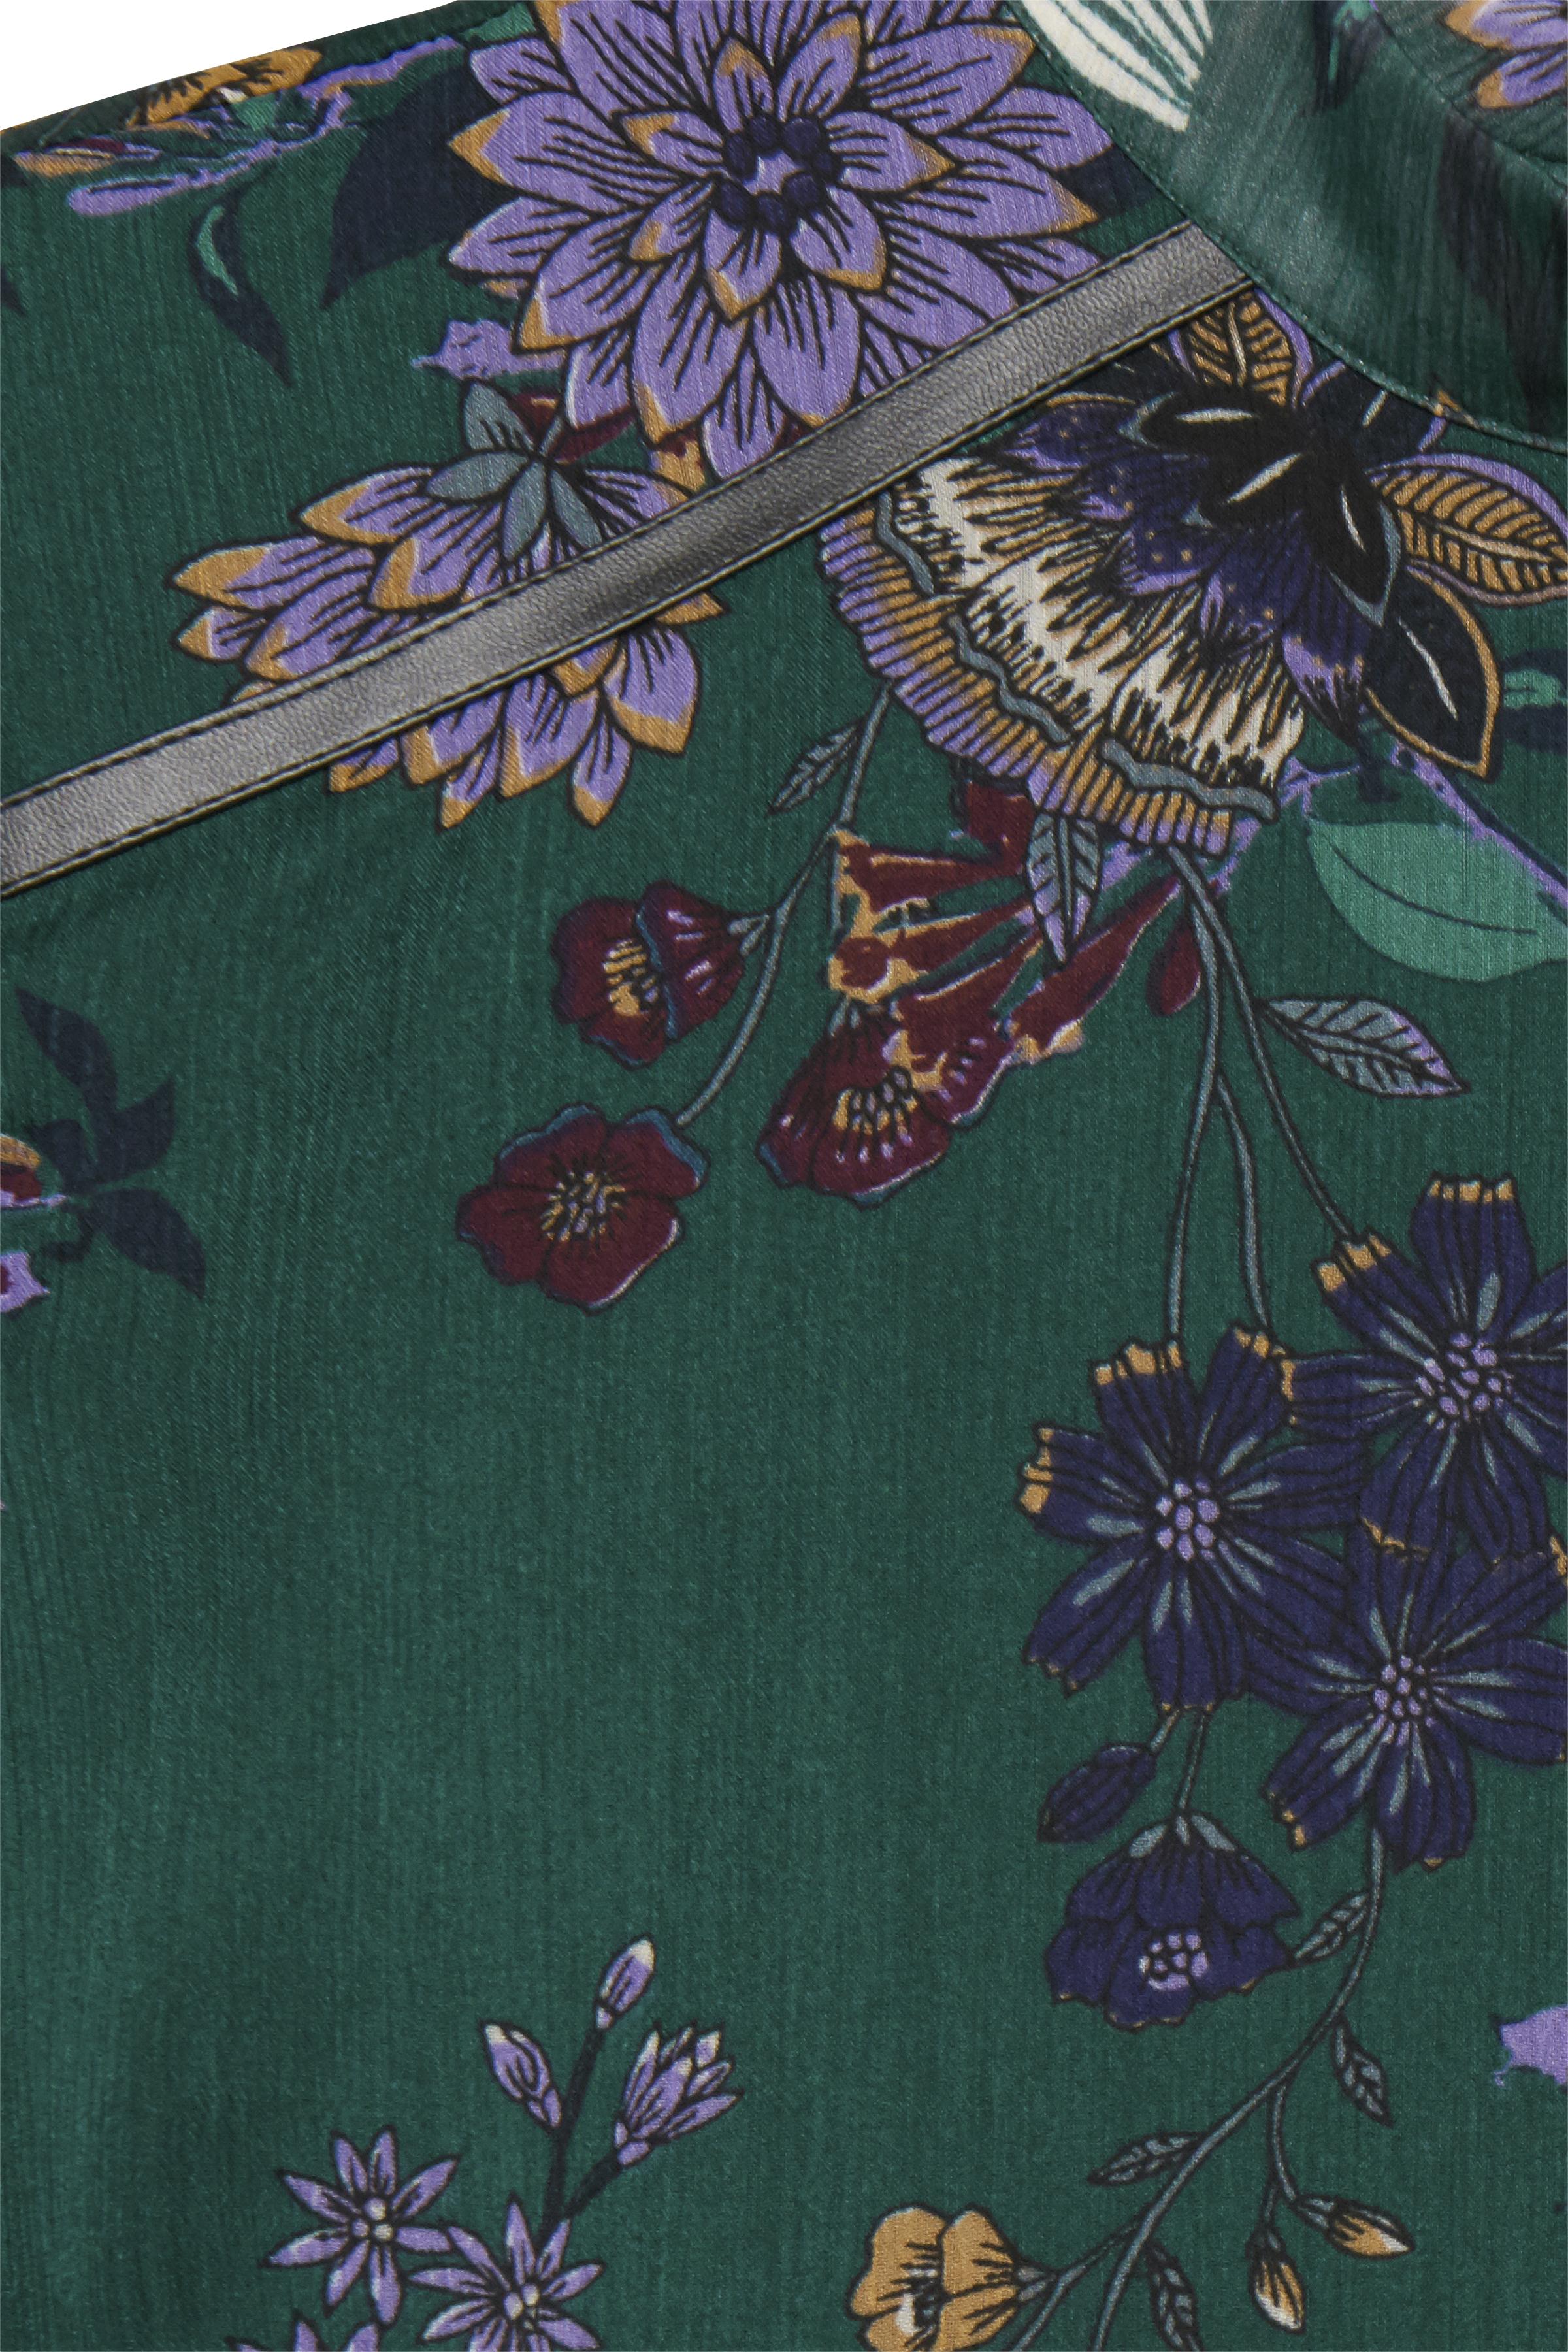 Amazon Green Kjole – Køb Amazon Green Kjole fra str. XS-XXL her